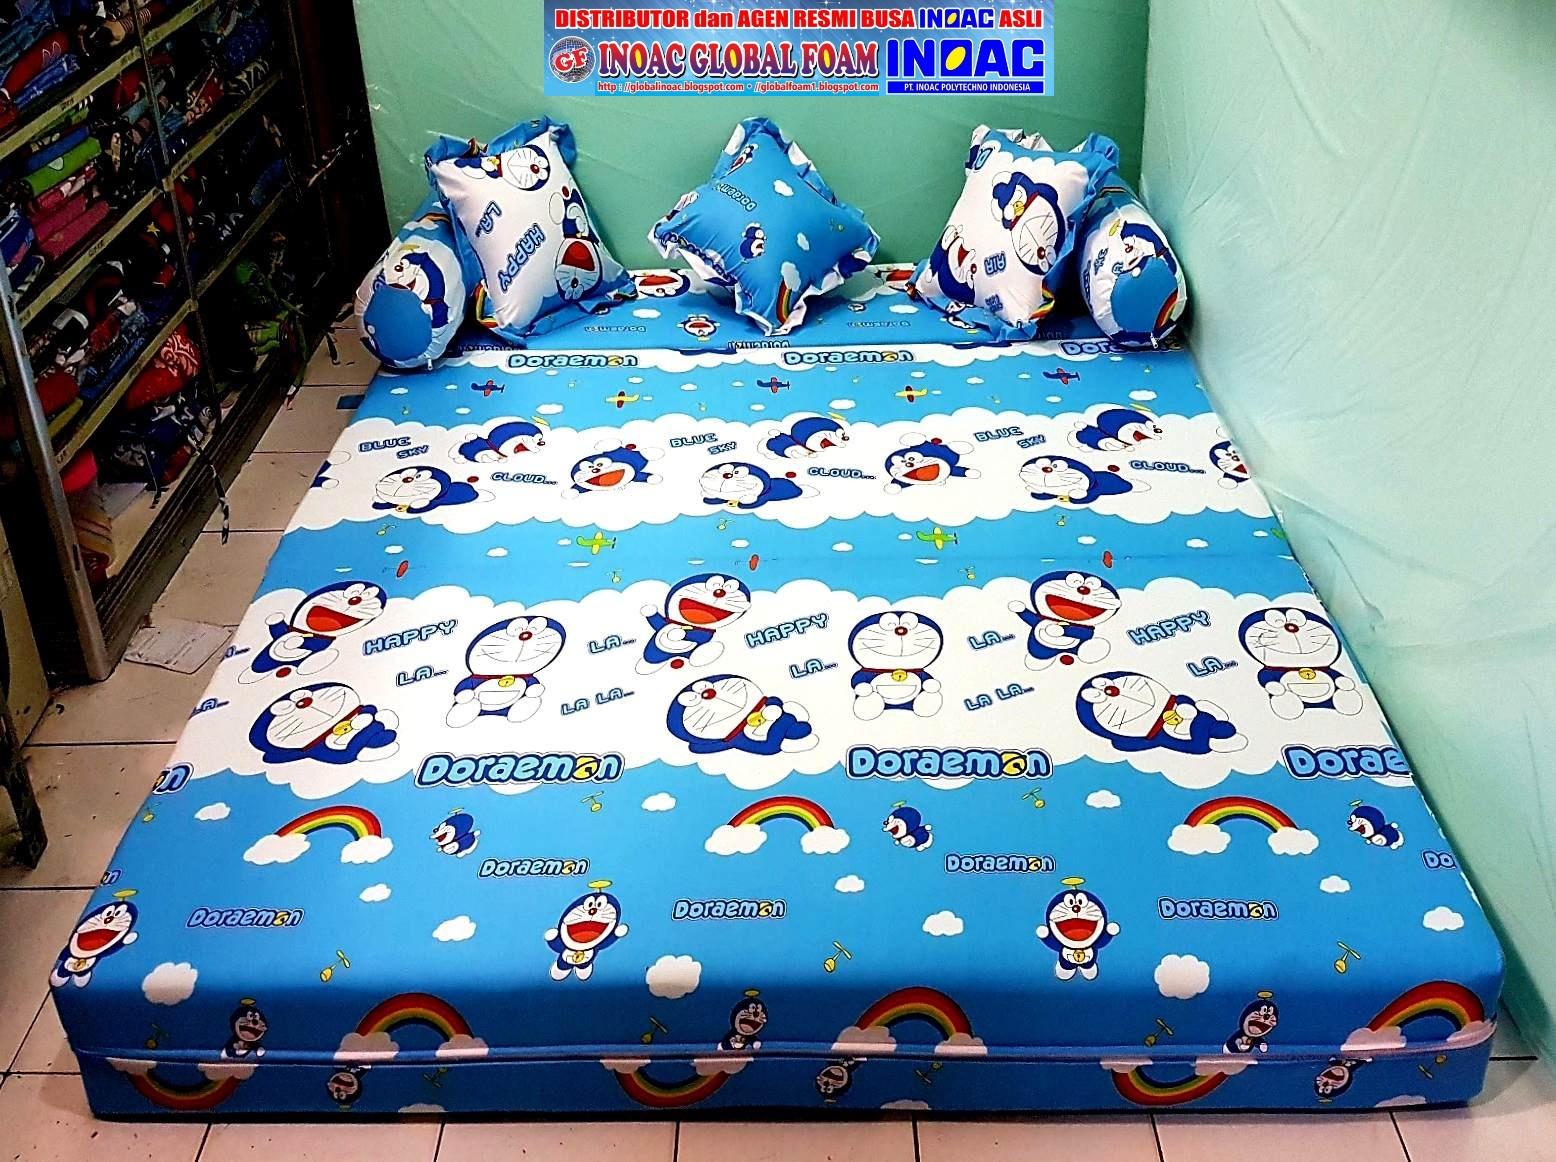 Harga Sofa Bed Inoac No 1 Jcpenney Clearance Sofas Kasur 2018 Distributor Busa Asli Global